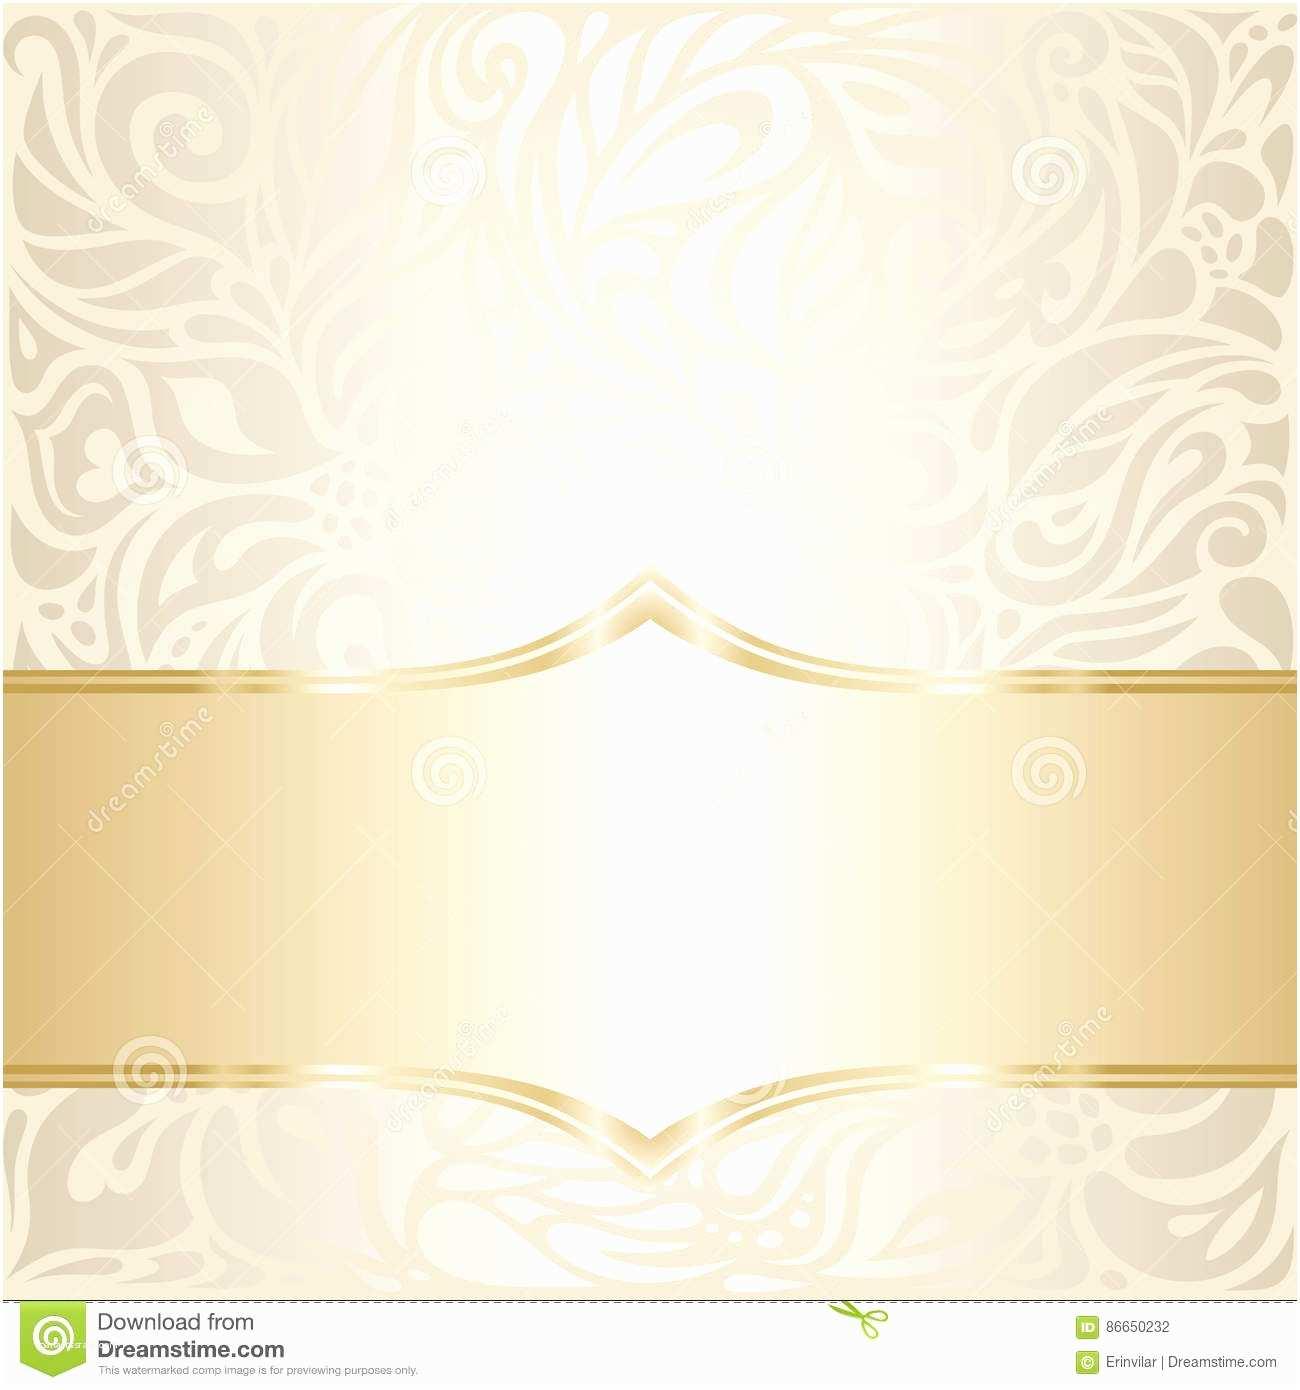 Wedding Invitation No Kids Floral Wedding Invitation Wallpaper Design In Ecru Stock